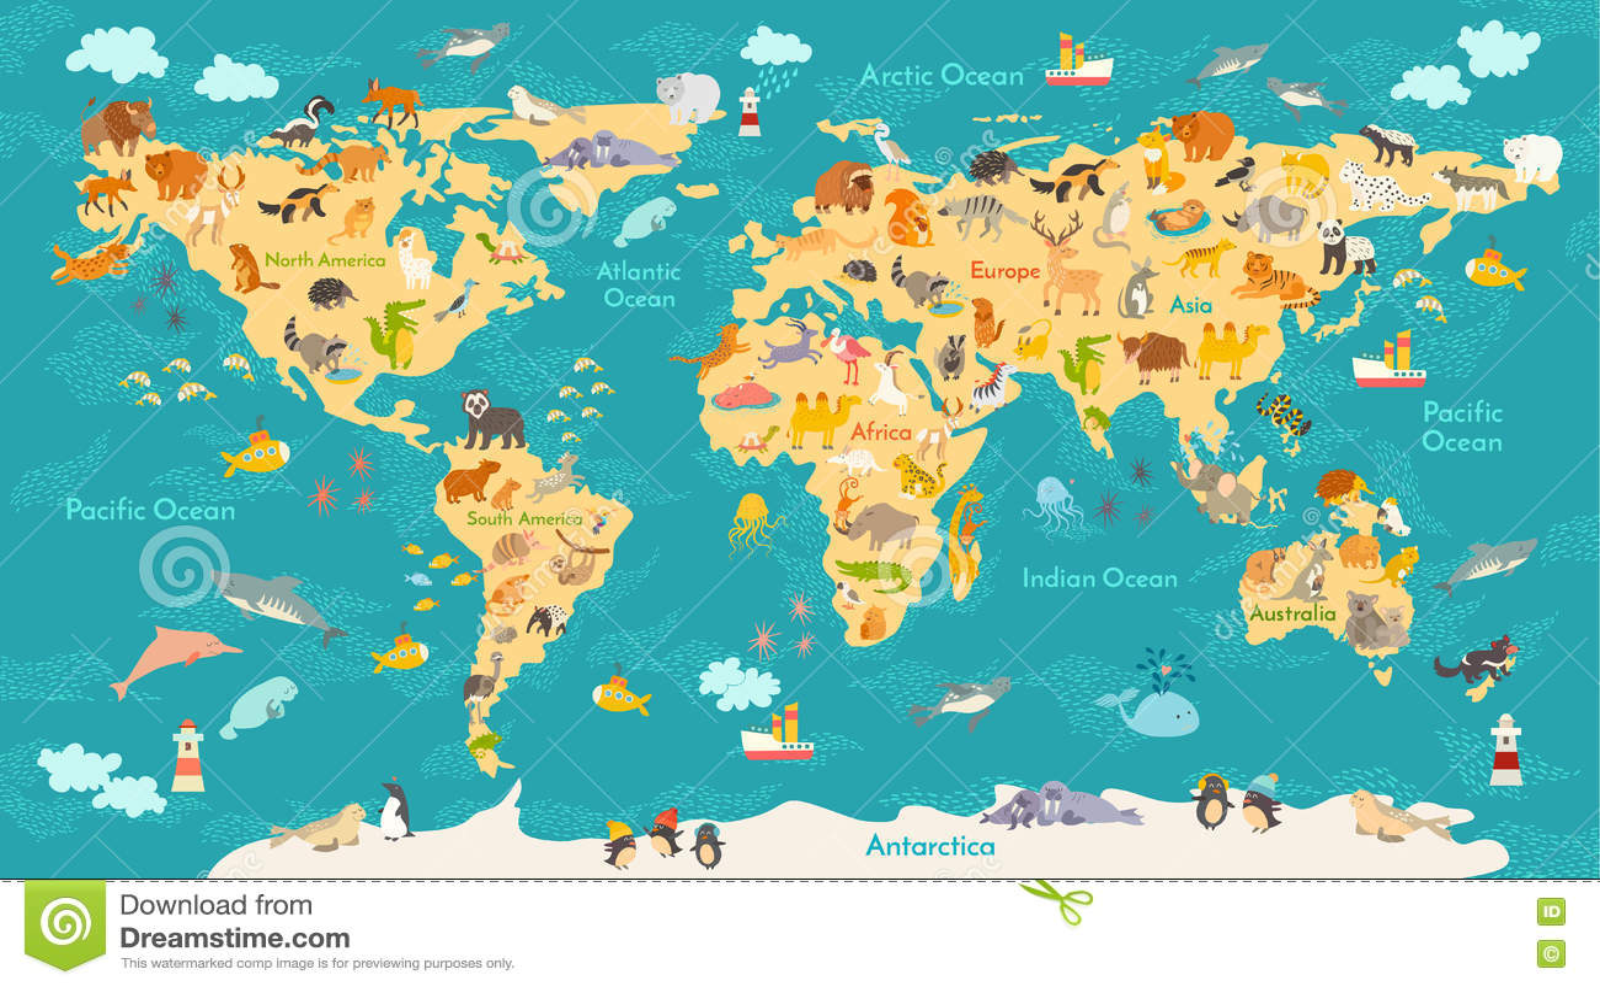 Animal Map For Kid World Vector Poster For Children Cute – Map World Poster Kids